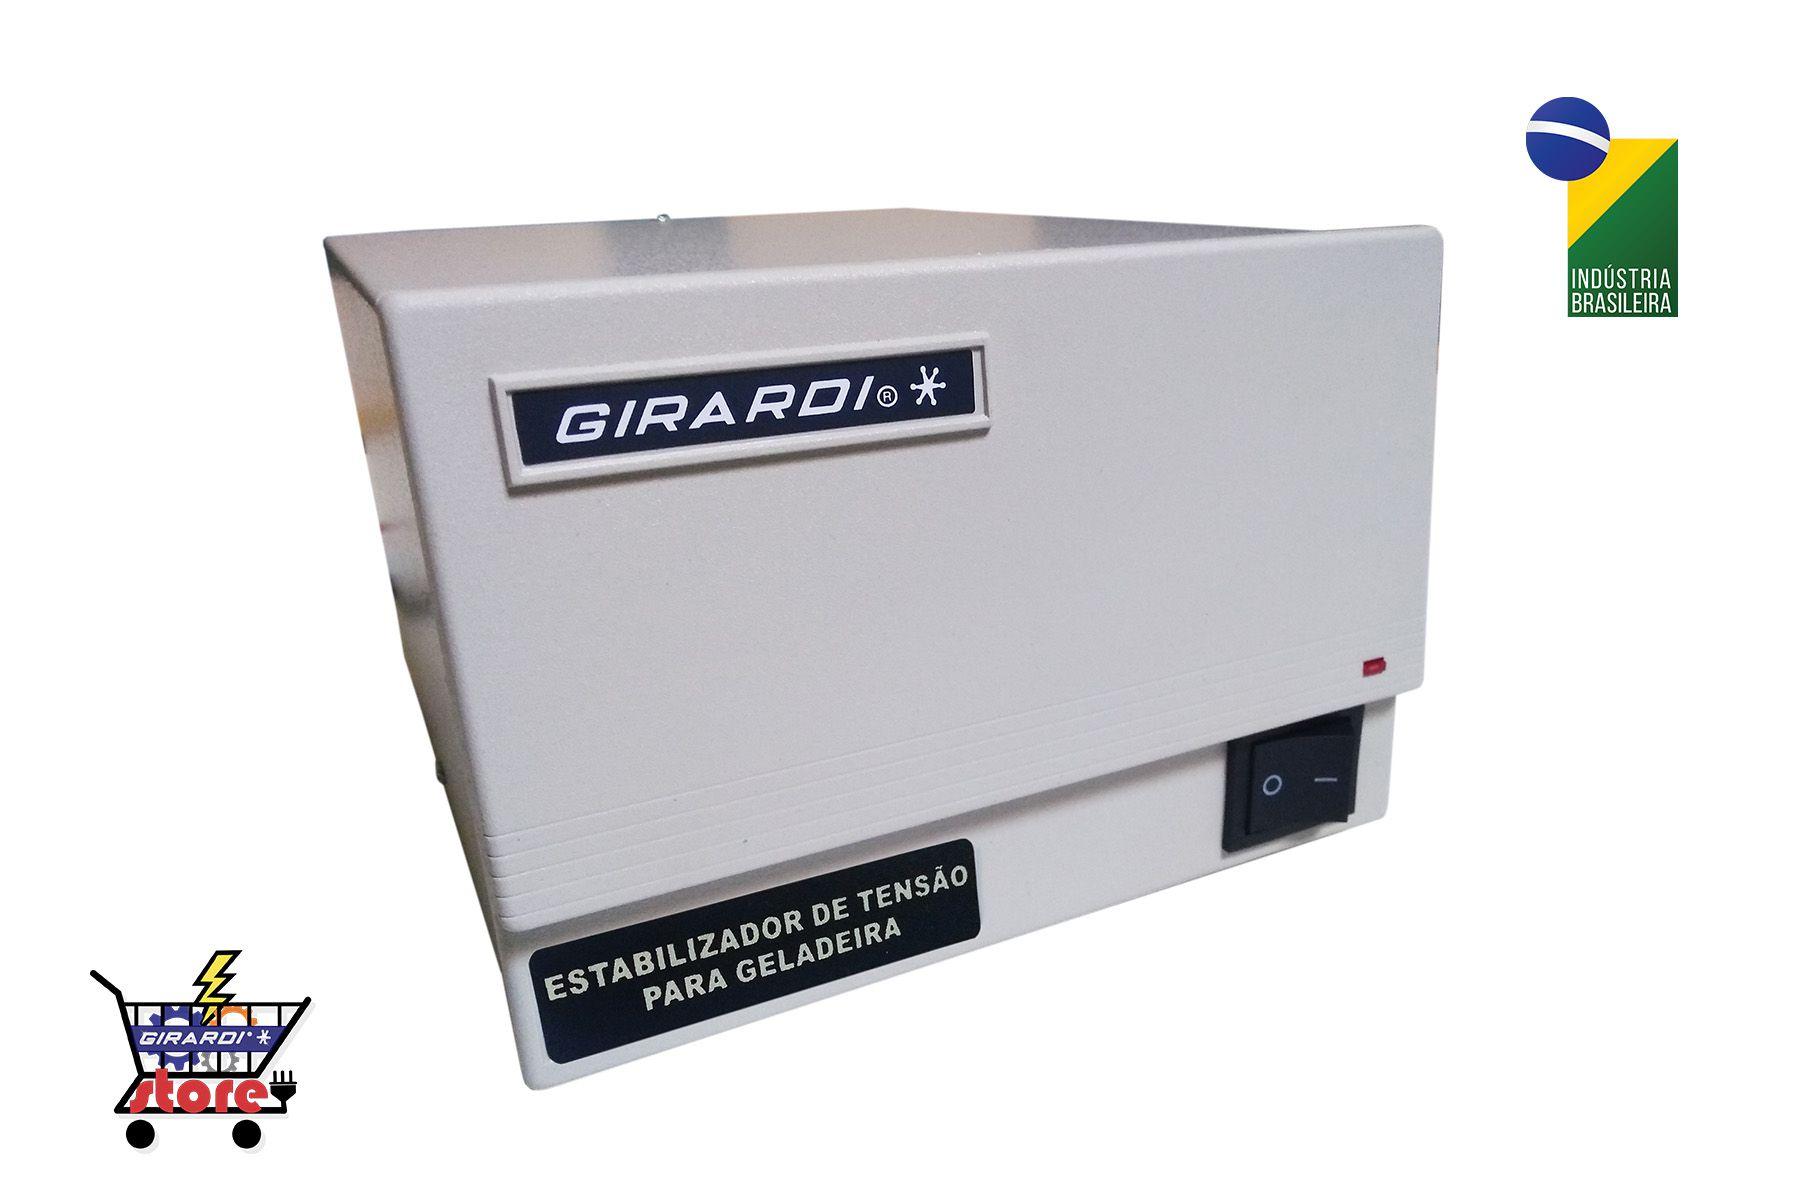 Protetor Eletrônico 1010 VA Girardi AM Bivolt / Saída 127 V